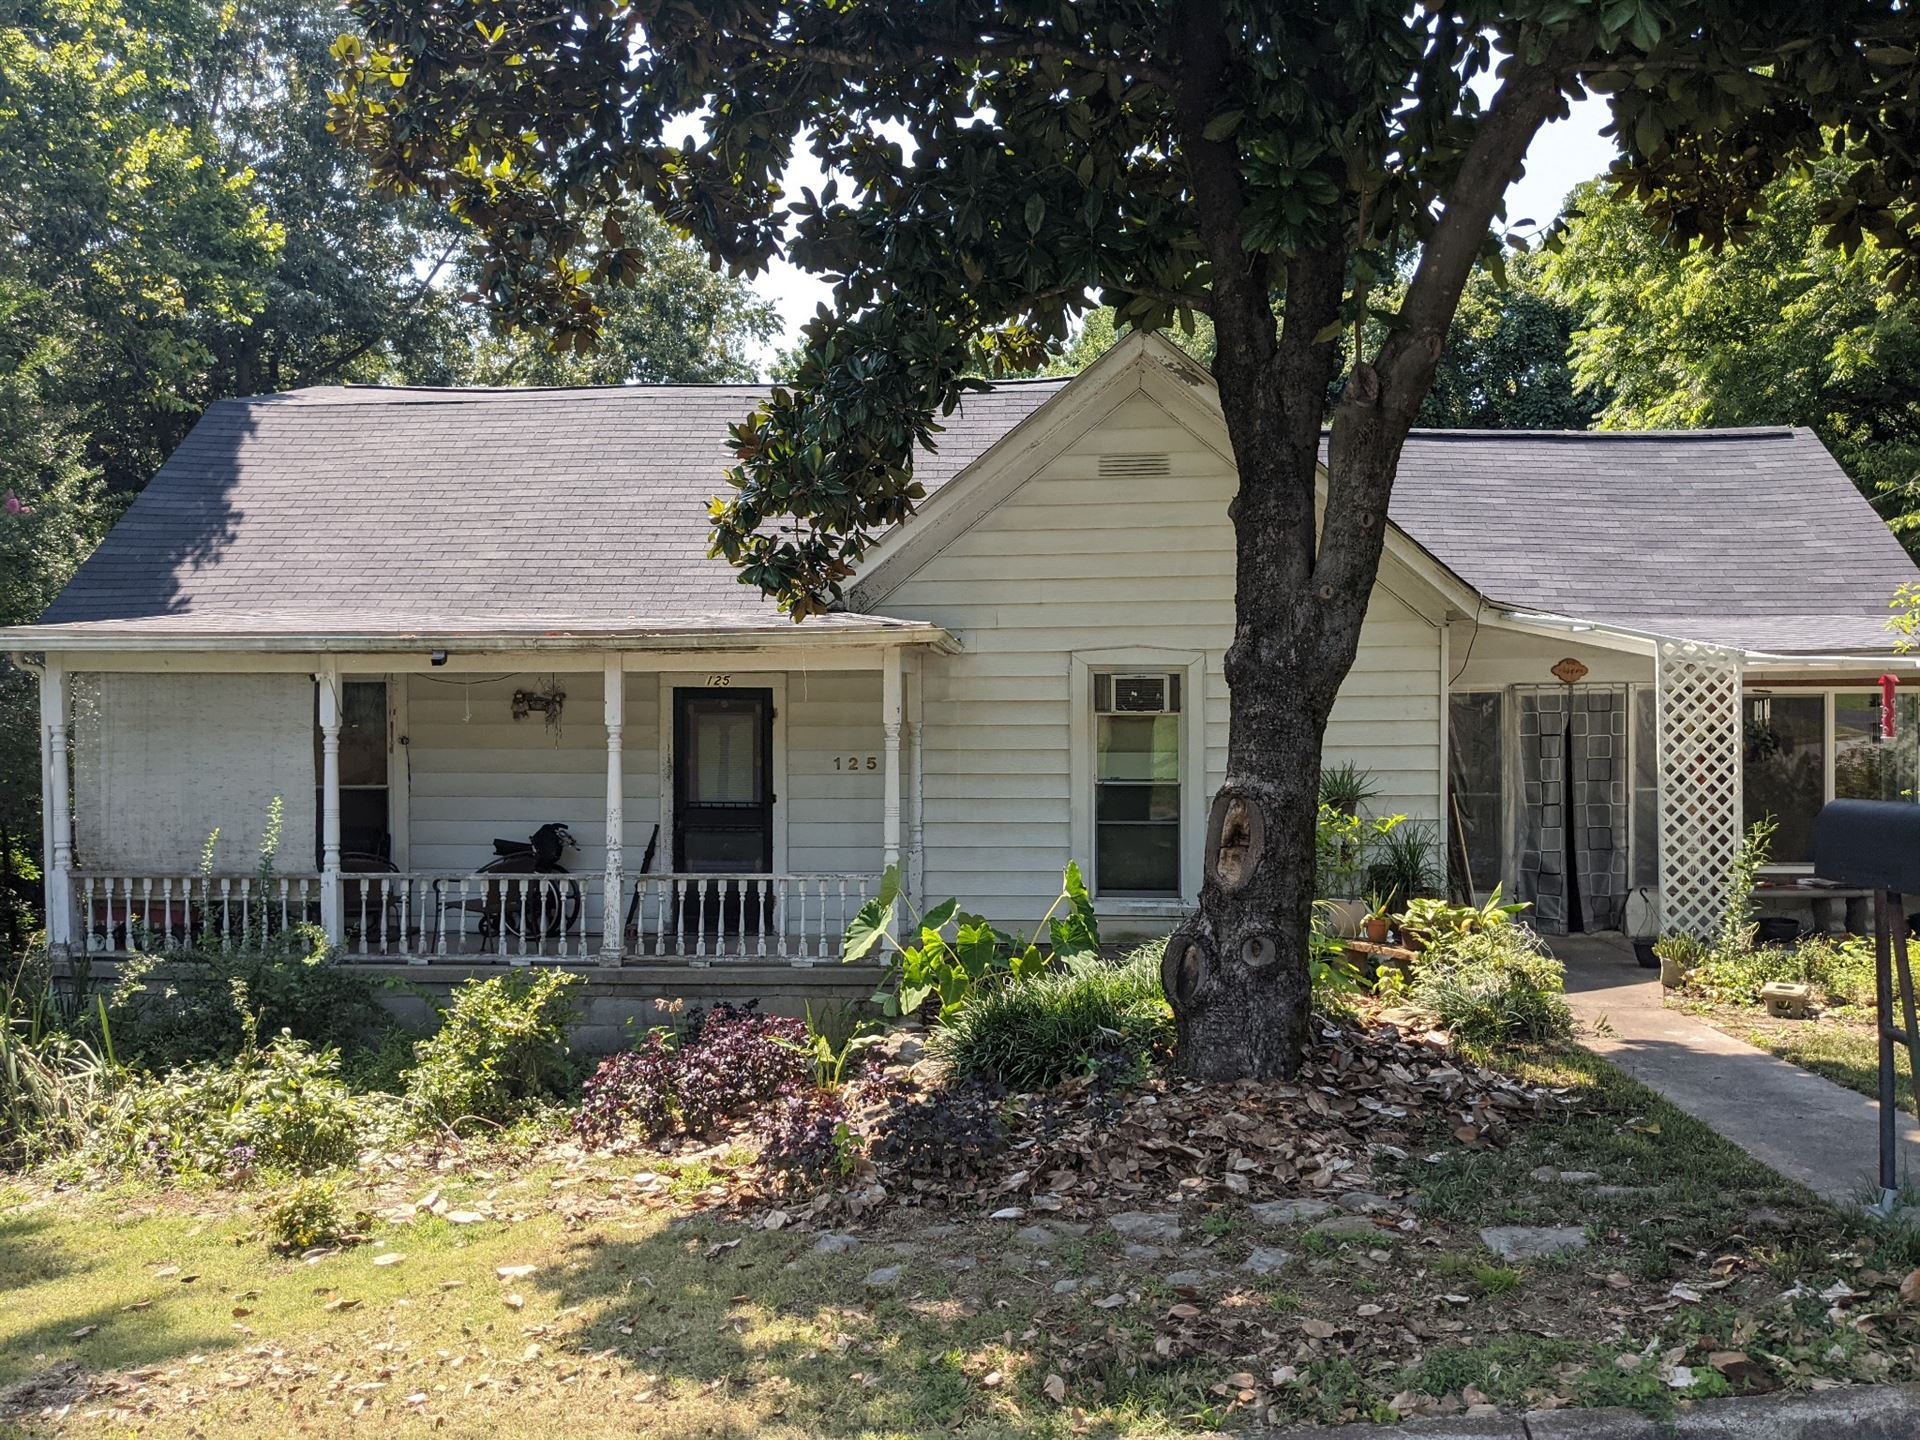 125 Lawn St, Clarksville, TN 37040 - MLS#: 2277760